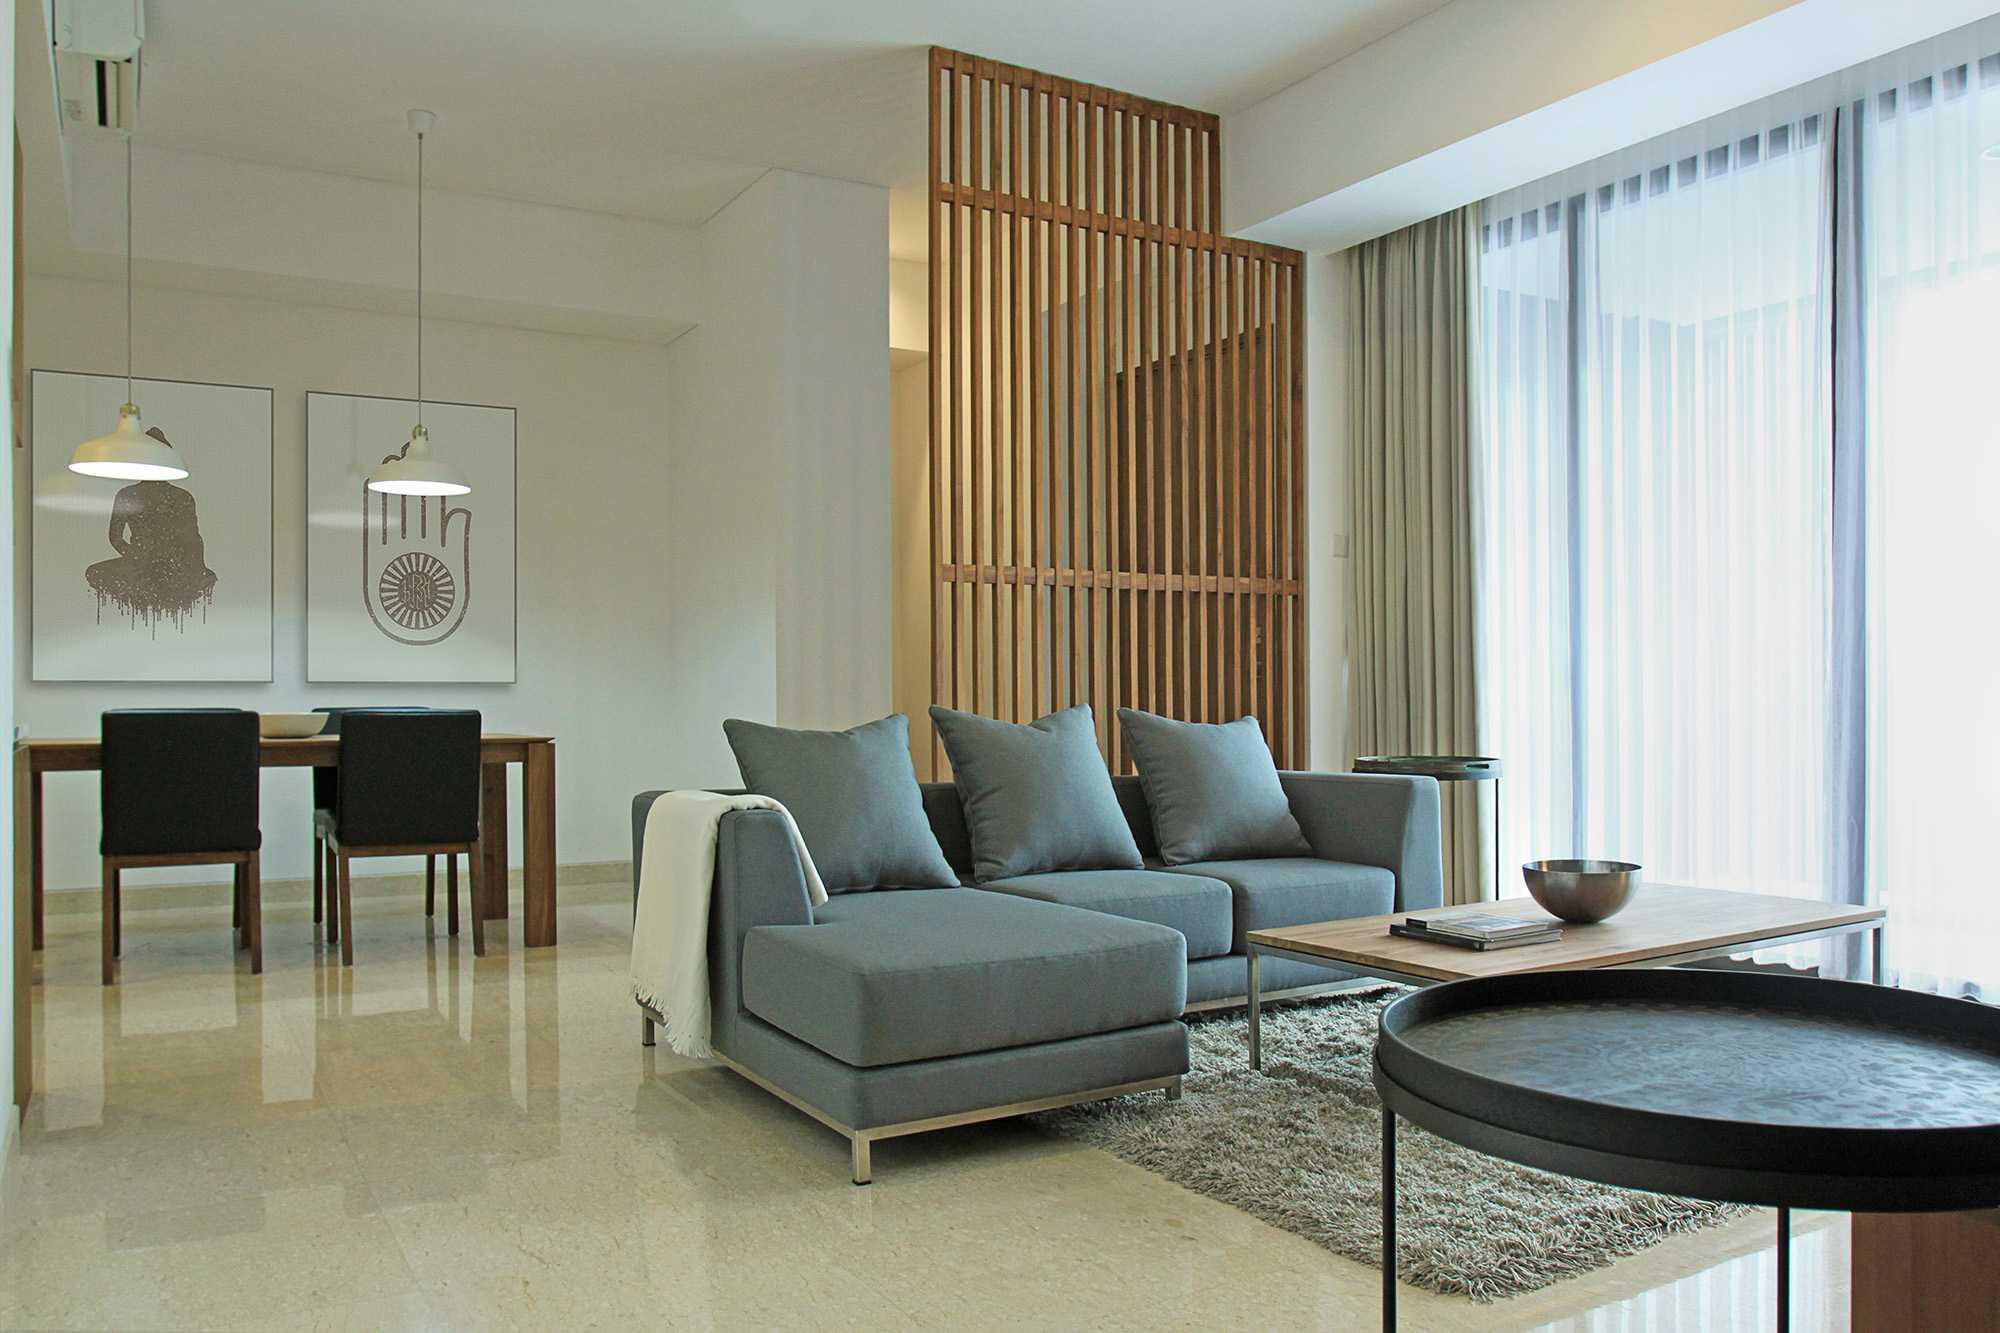 G+G Architect Studio 1 Park Avenue Jakarta, Daerah Khusus Ibukota Jakarta, Indonesia  1-Park-01   38320